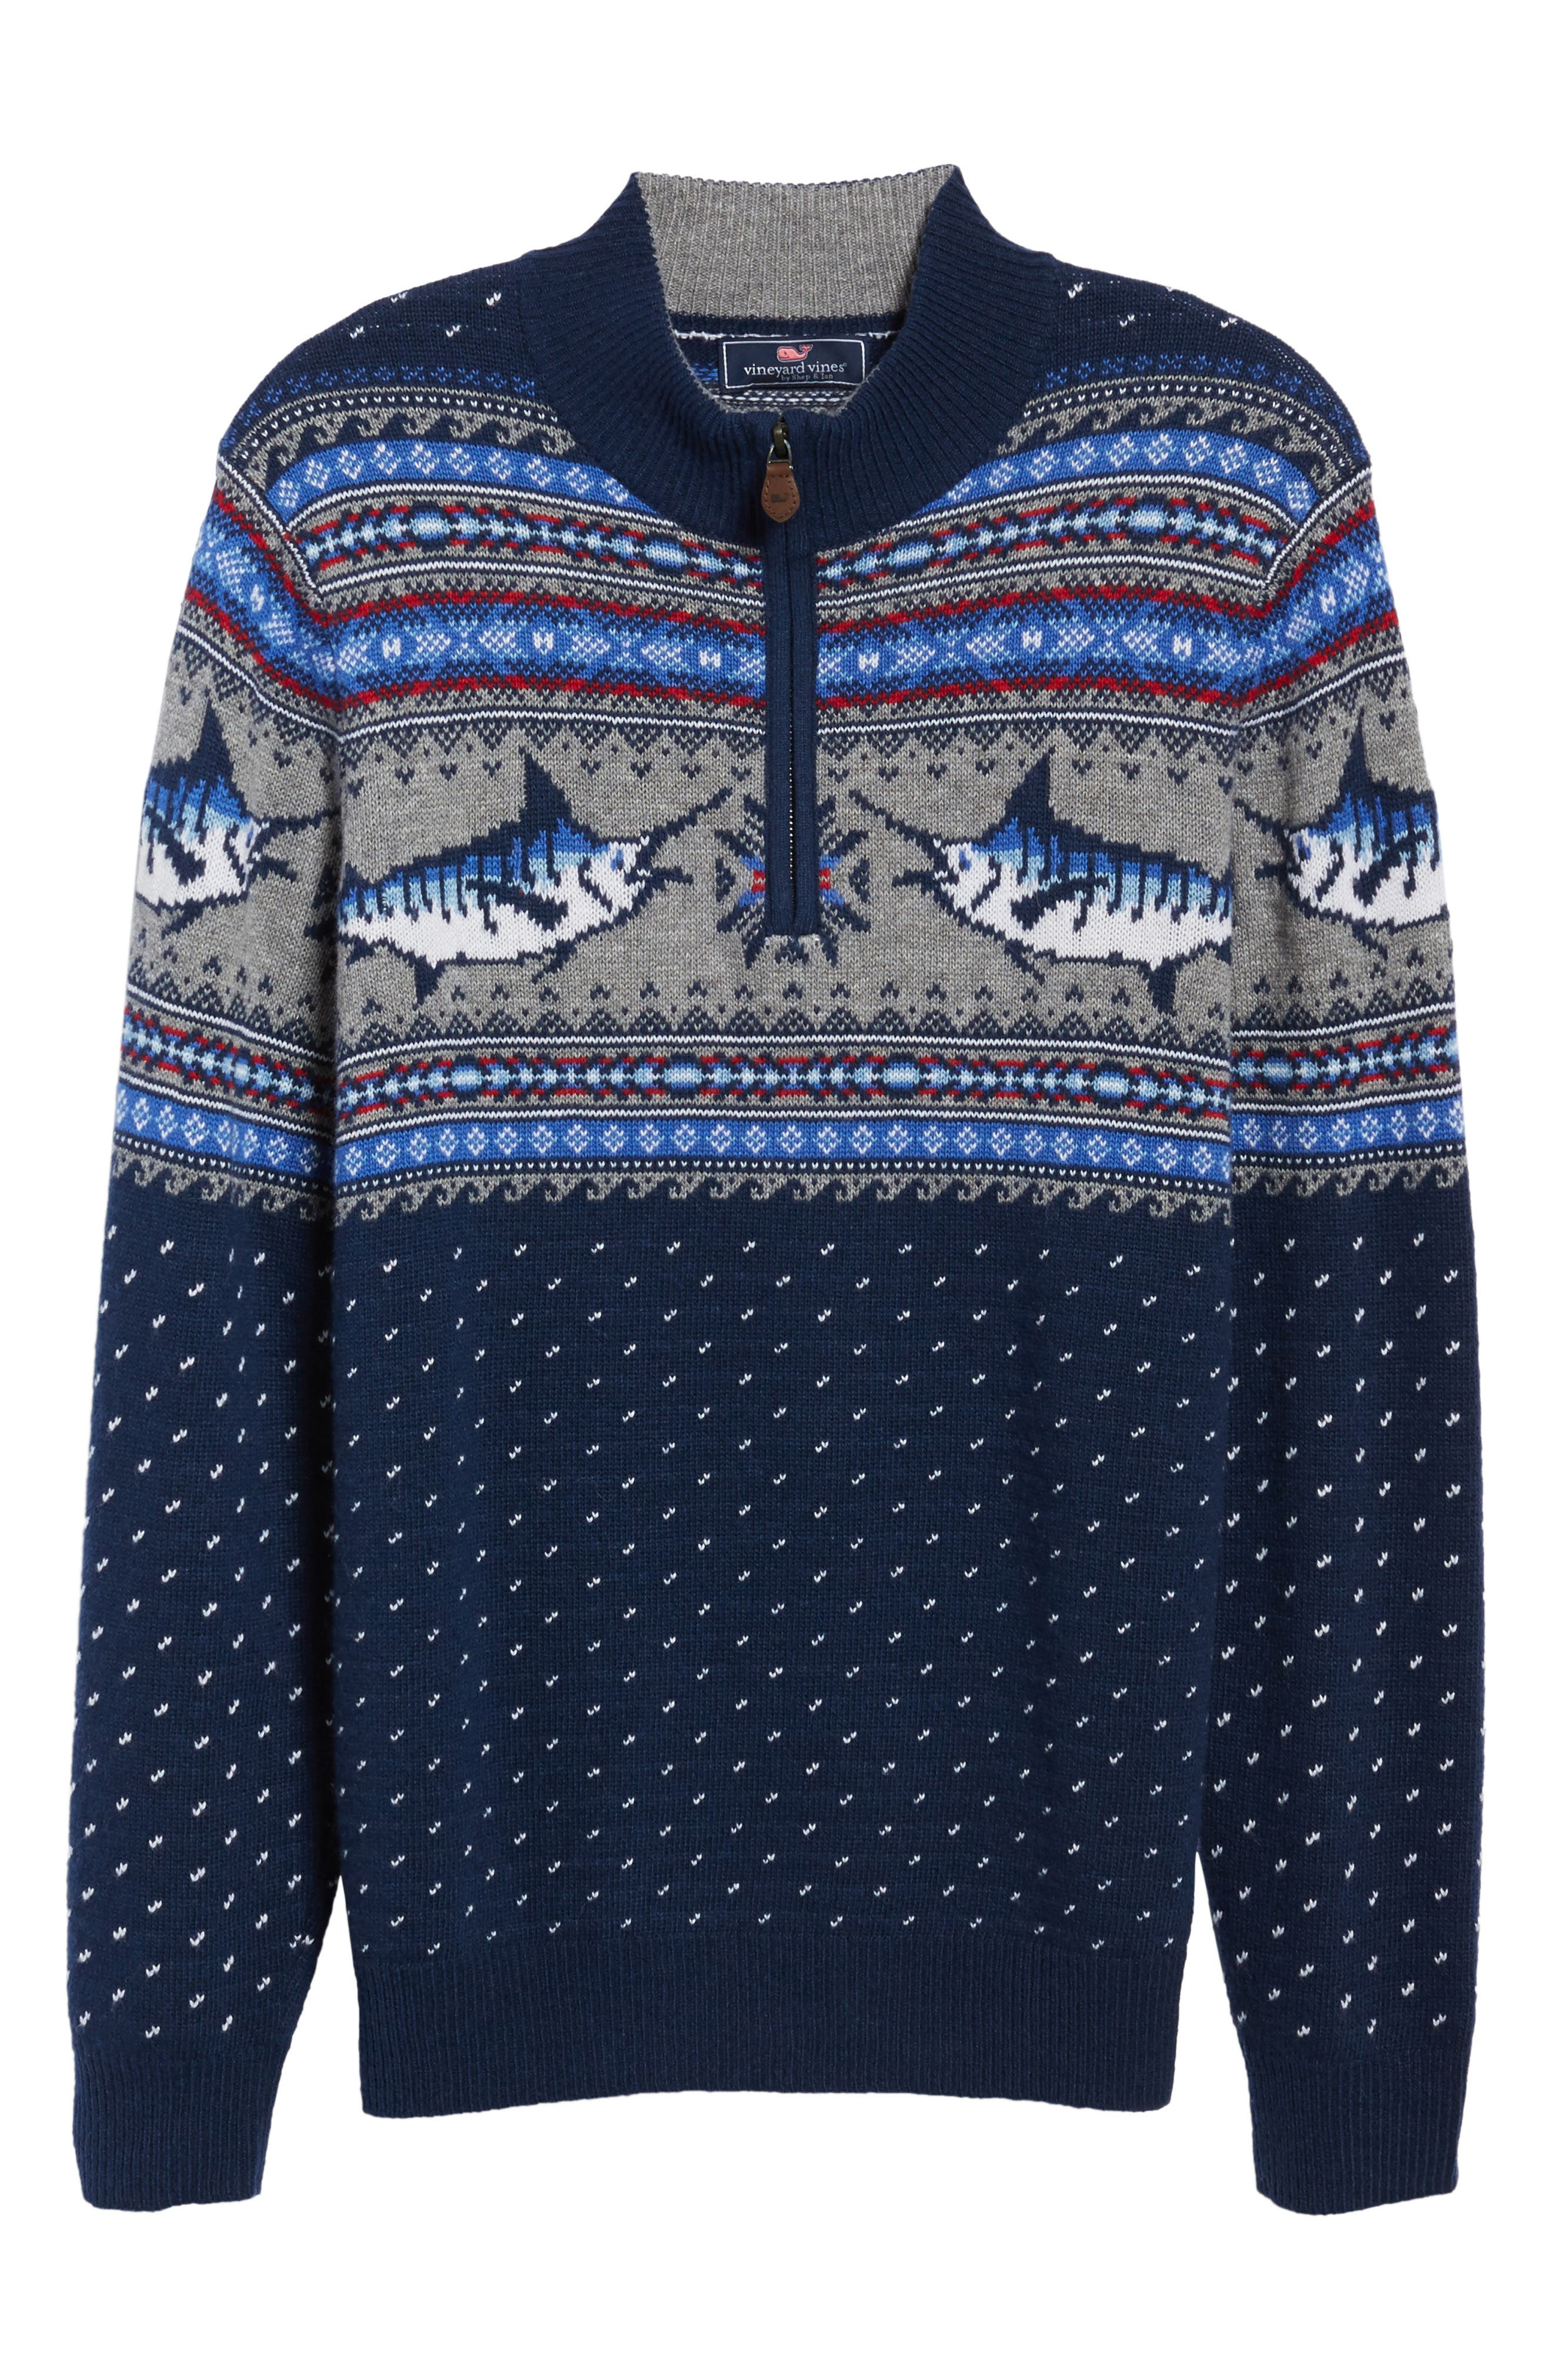 Marlin Fair Isle Quarter Zip Sweater,                             Alternate thumbnail 6, color,                             400